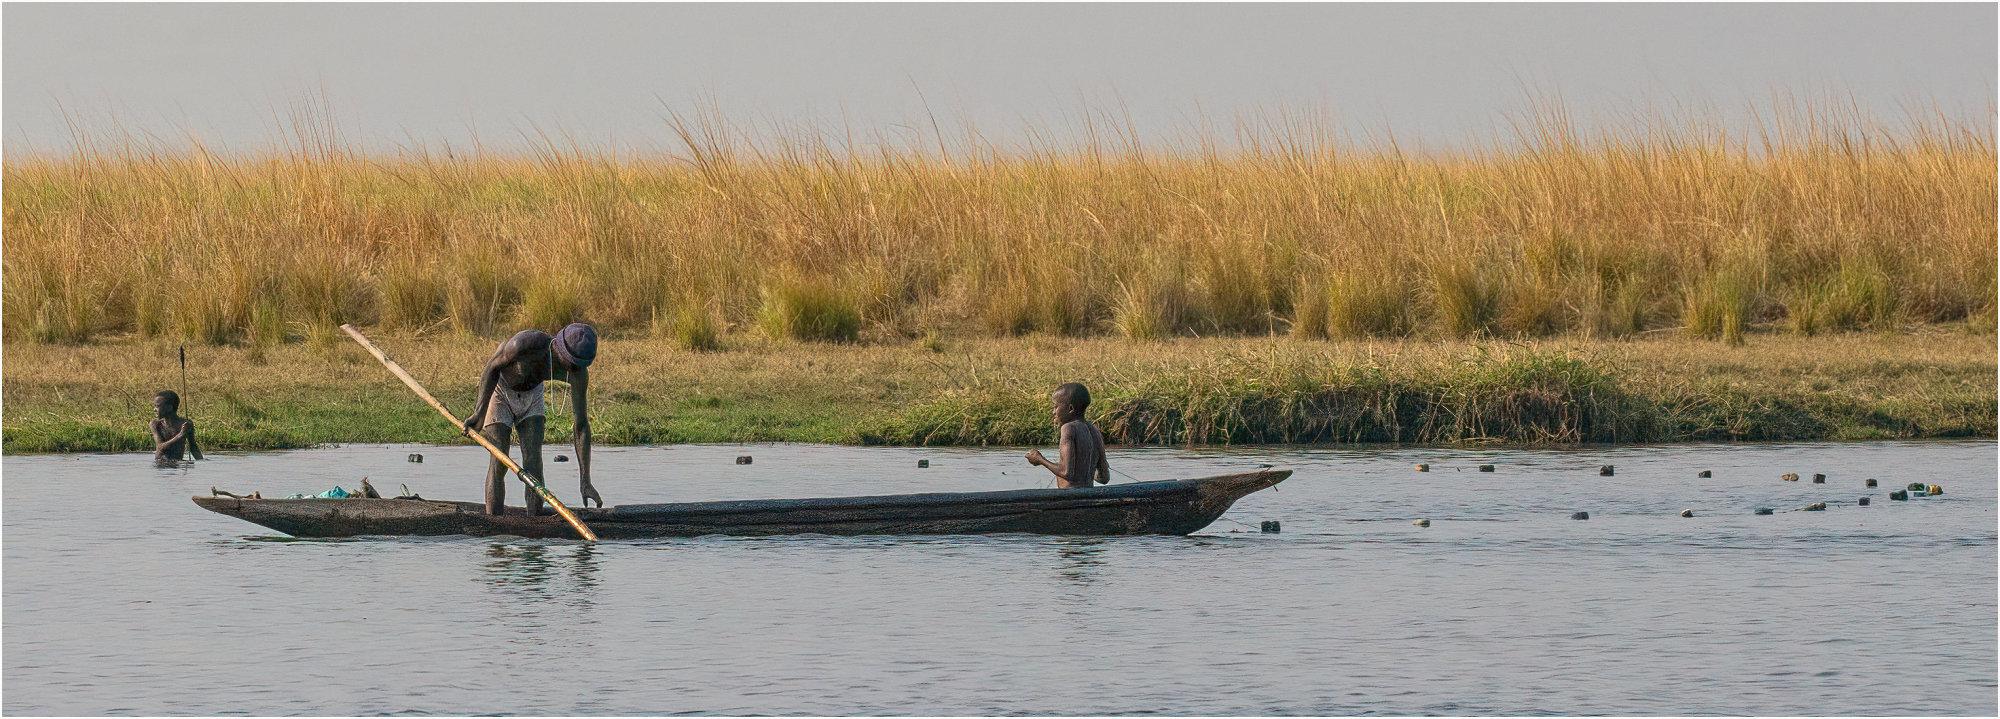 Fishing in the Chobe river.